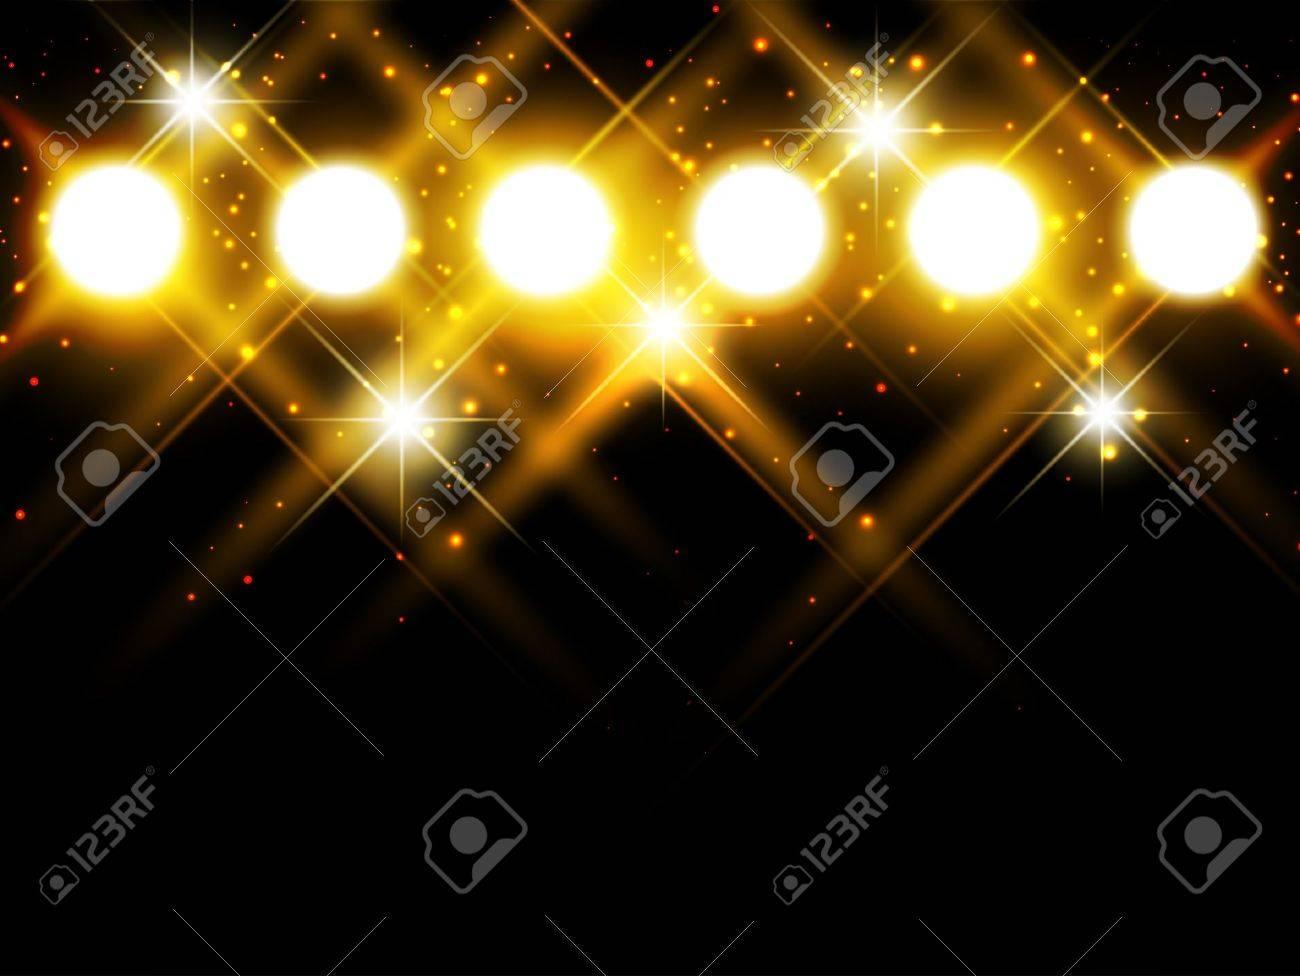 spotlights with stars over dark background, copyspace - 11411437